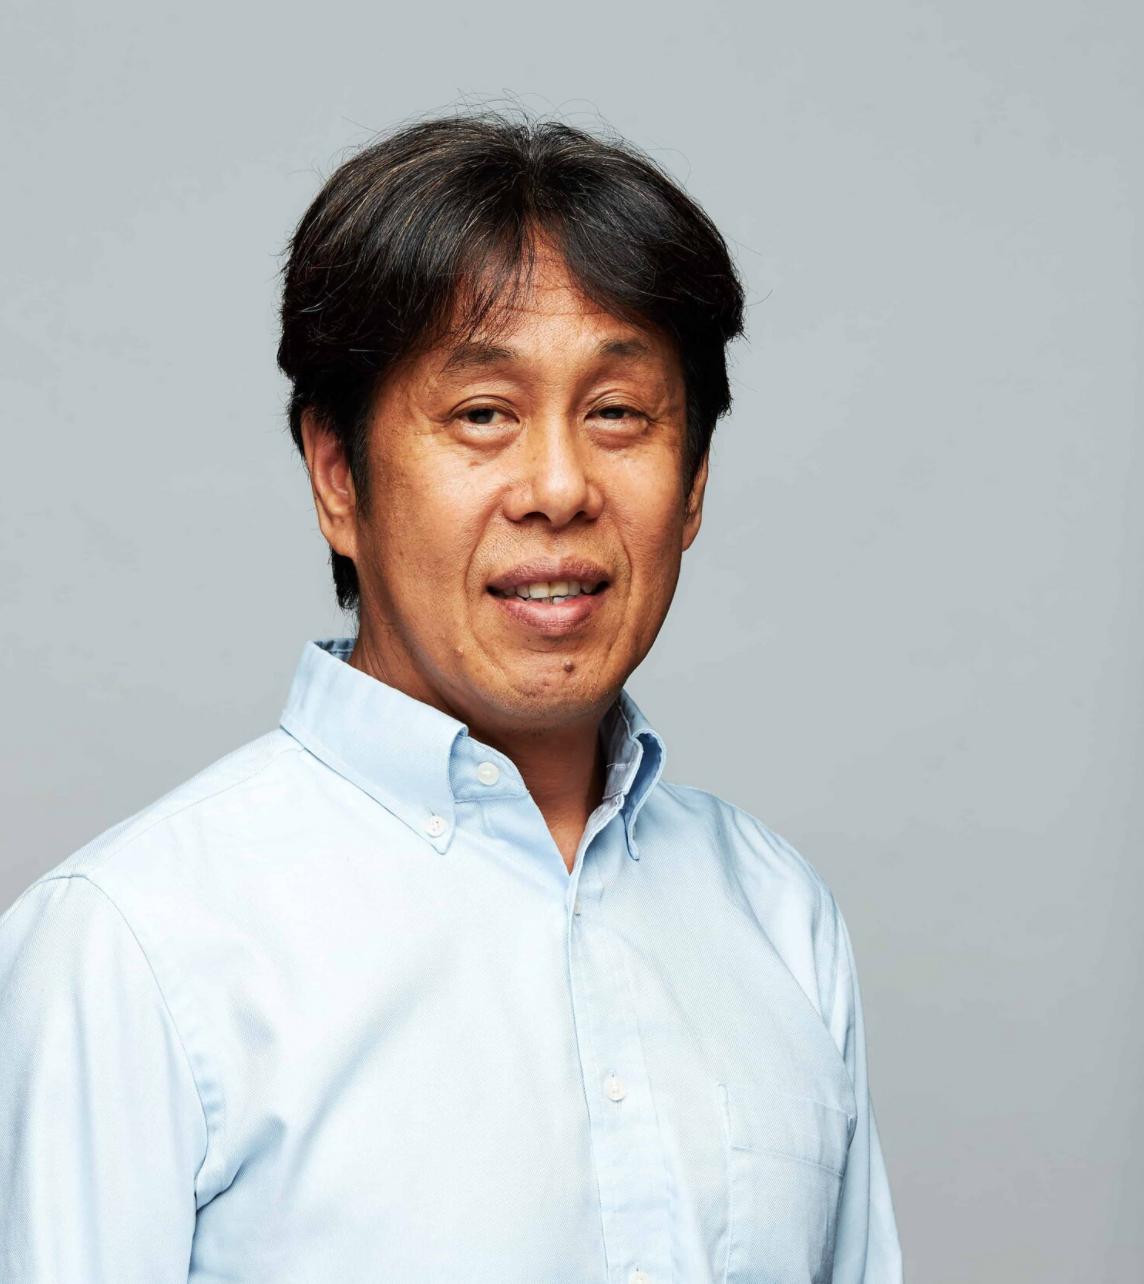 Katsunori Mizuno